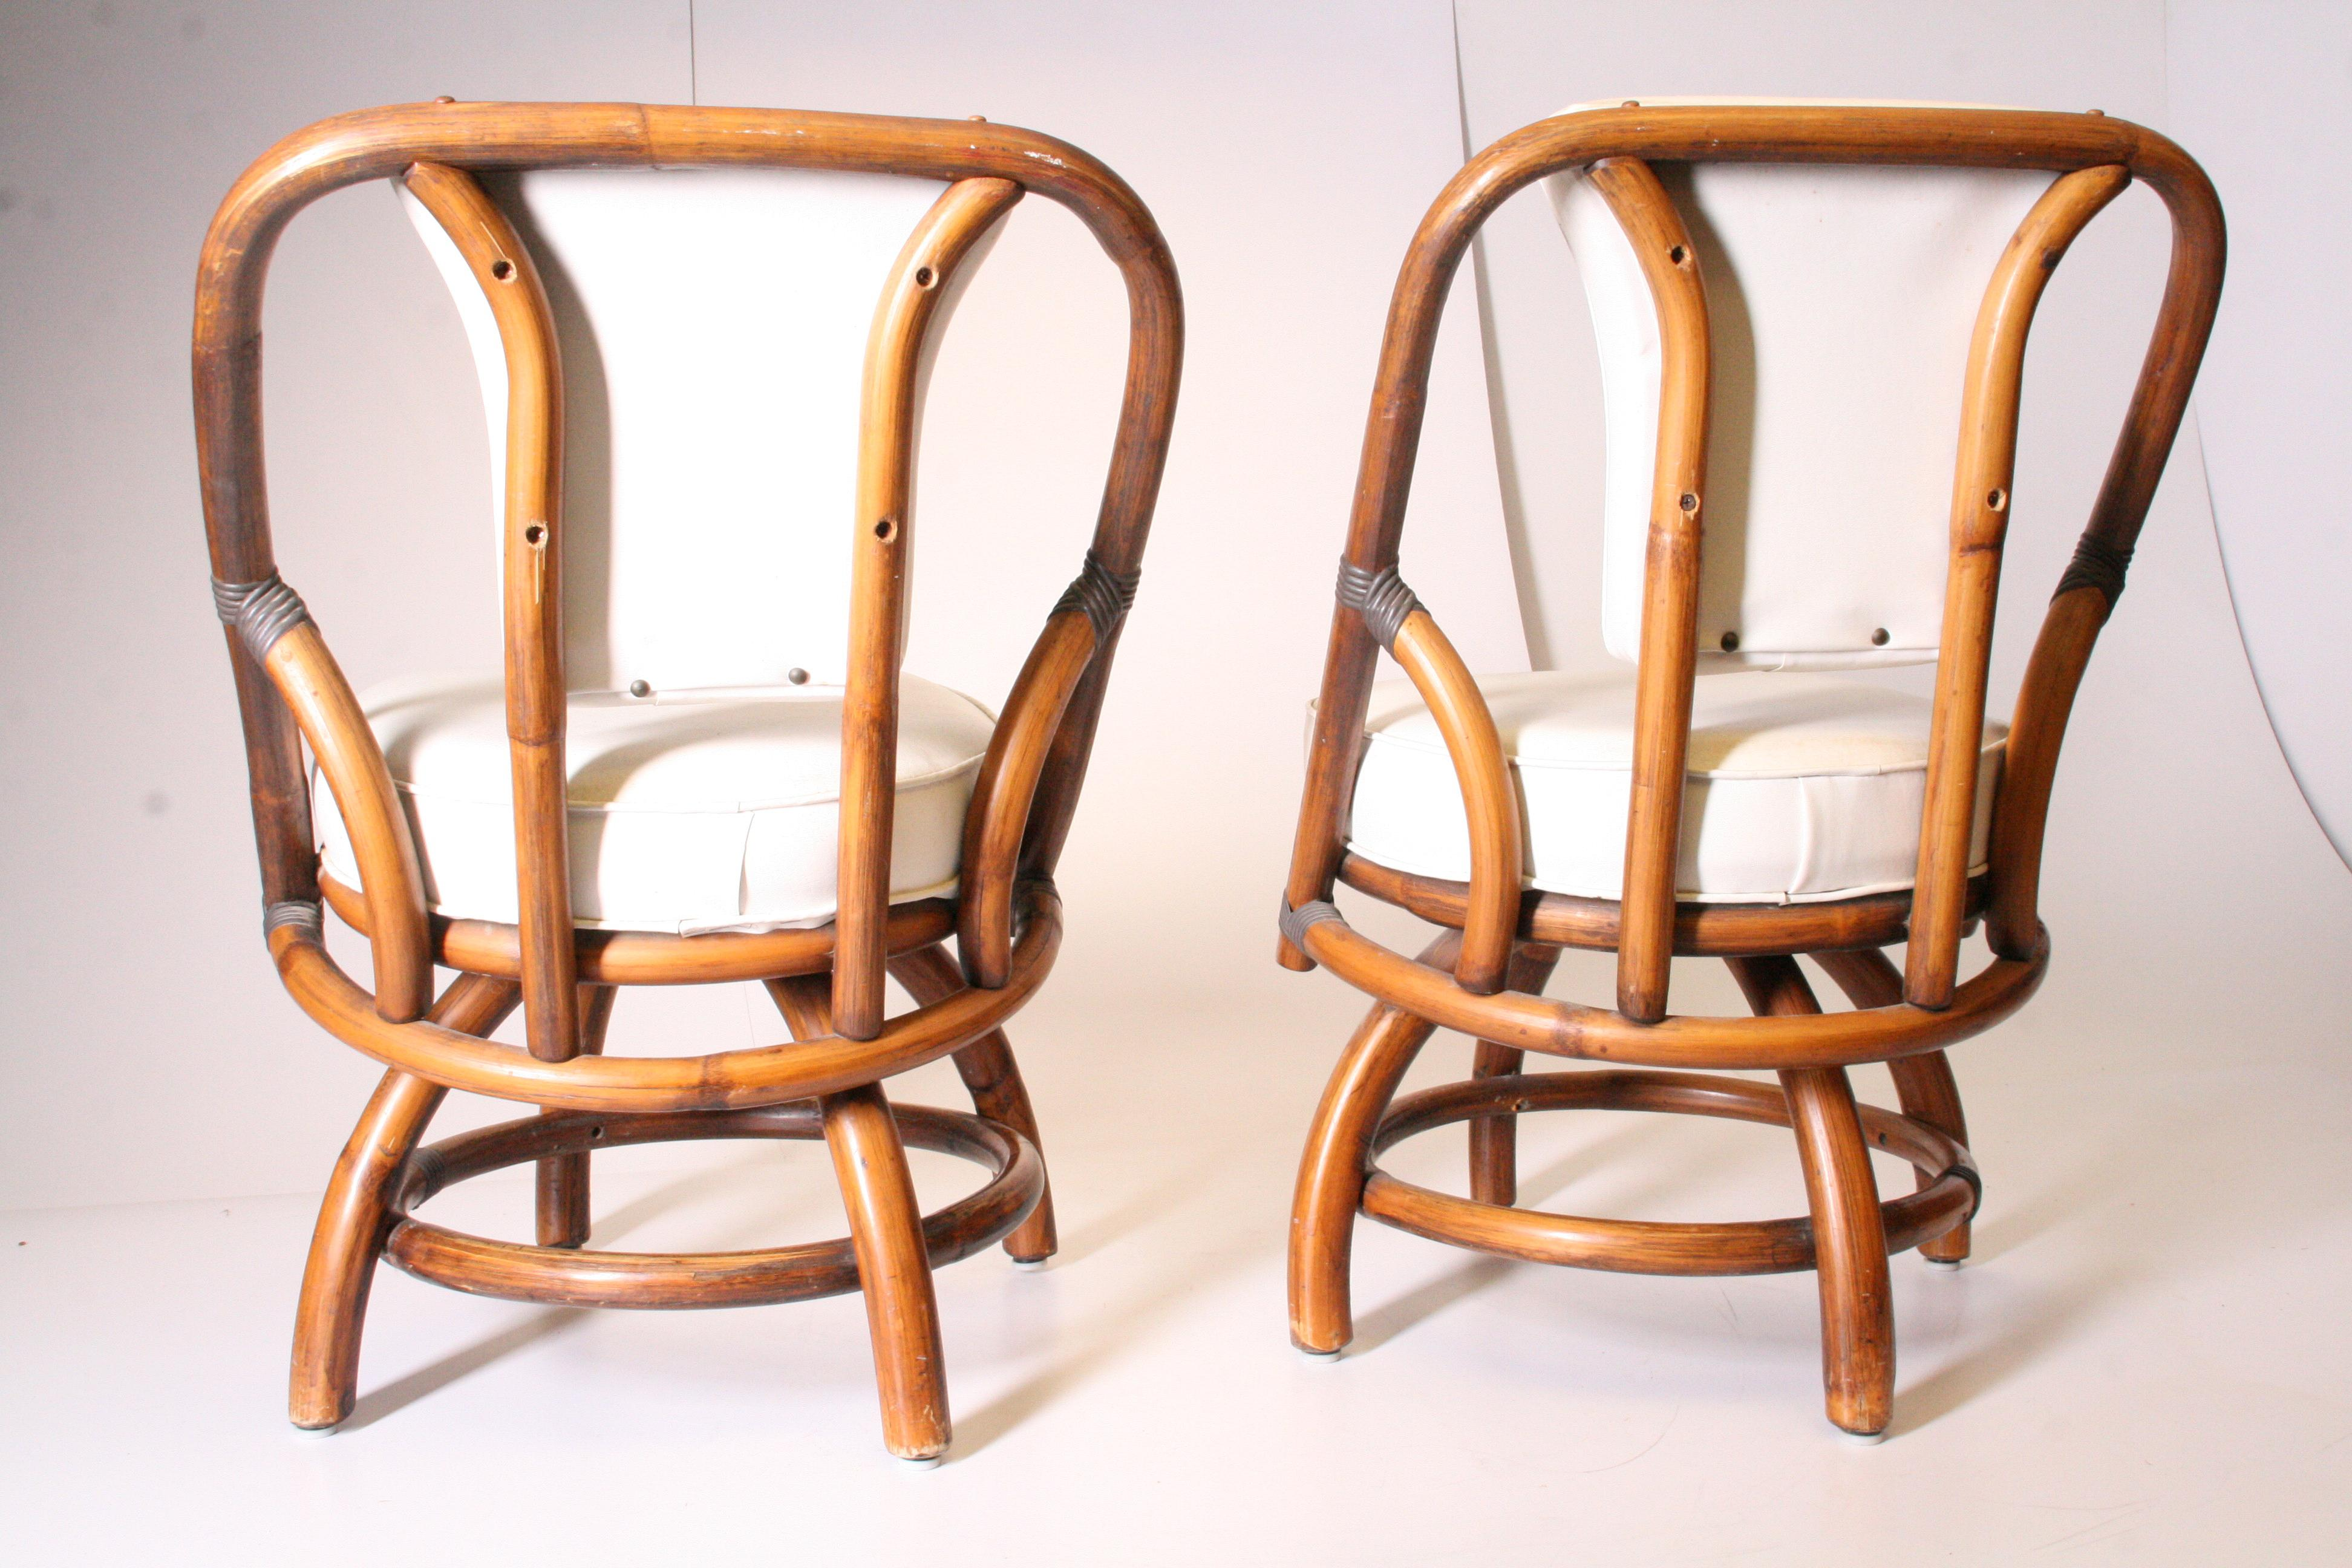 Genial Boho Chic Bamboo U0026 Rattan Swivel Chairs   A Pair   Image 5 Of 11